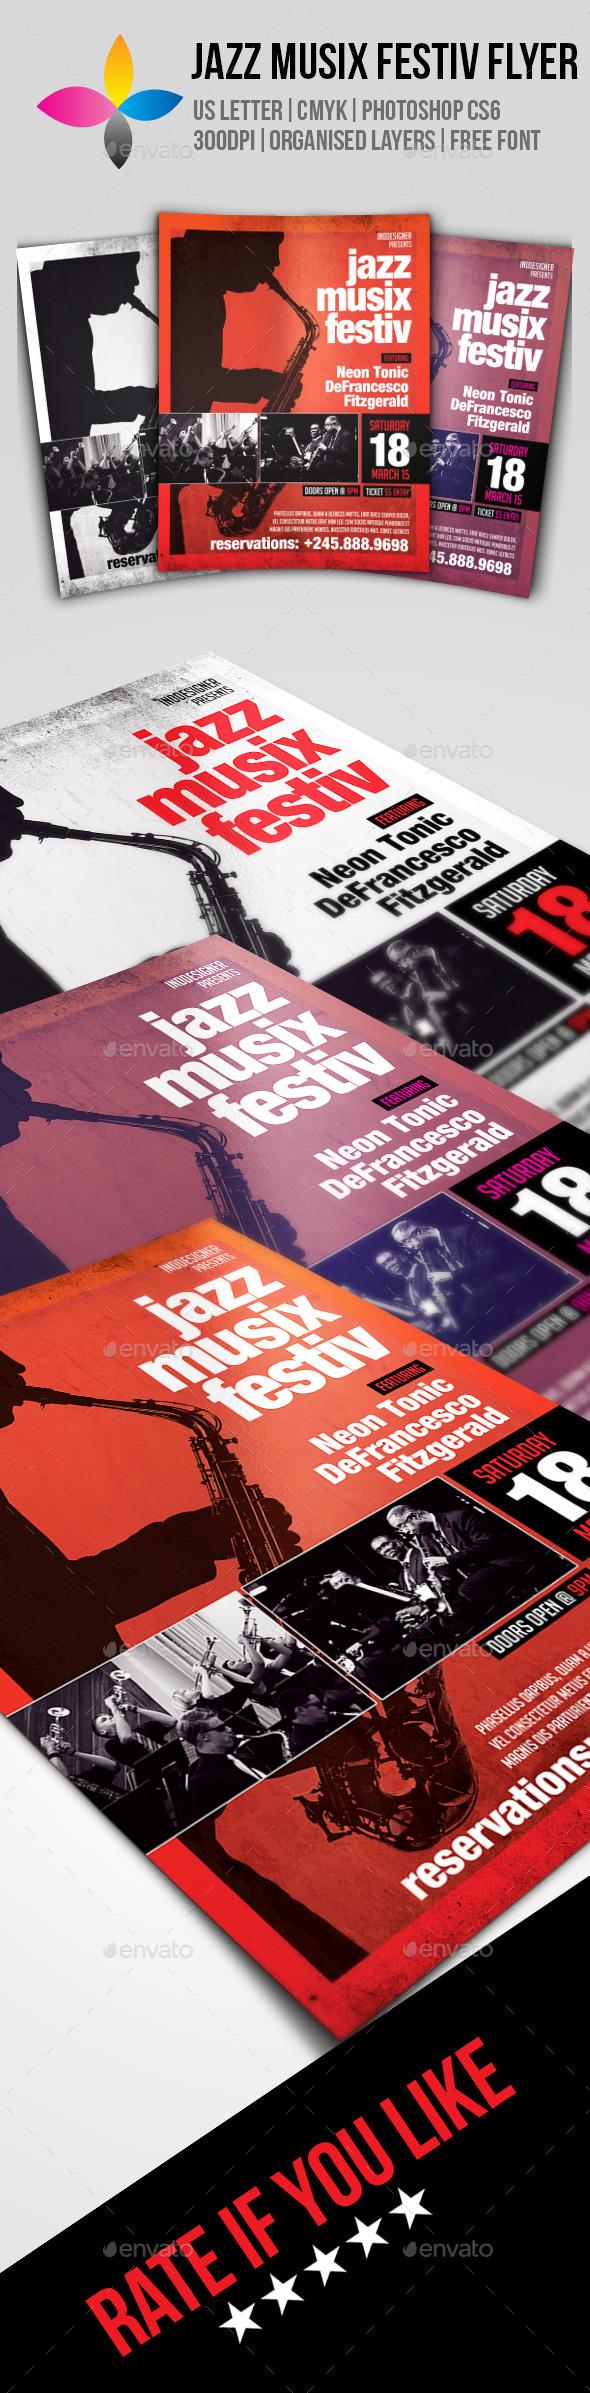 Jazz Musix Festiv Flyer - Clubs & Parties Events